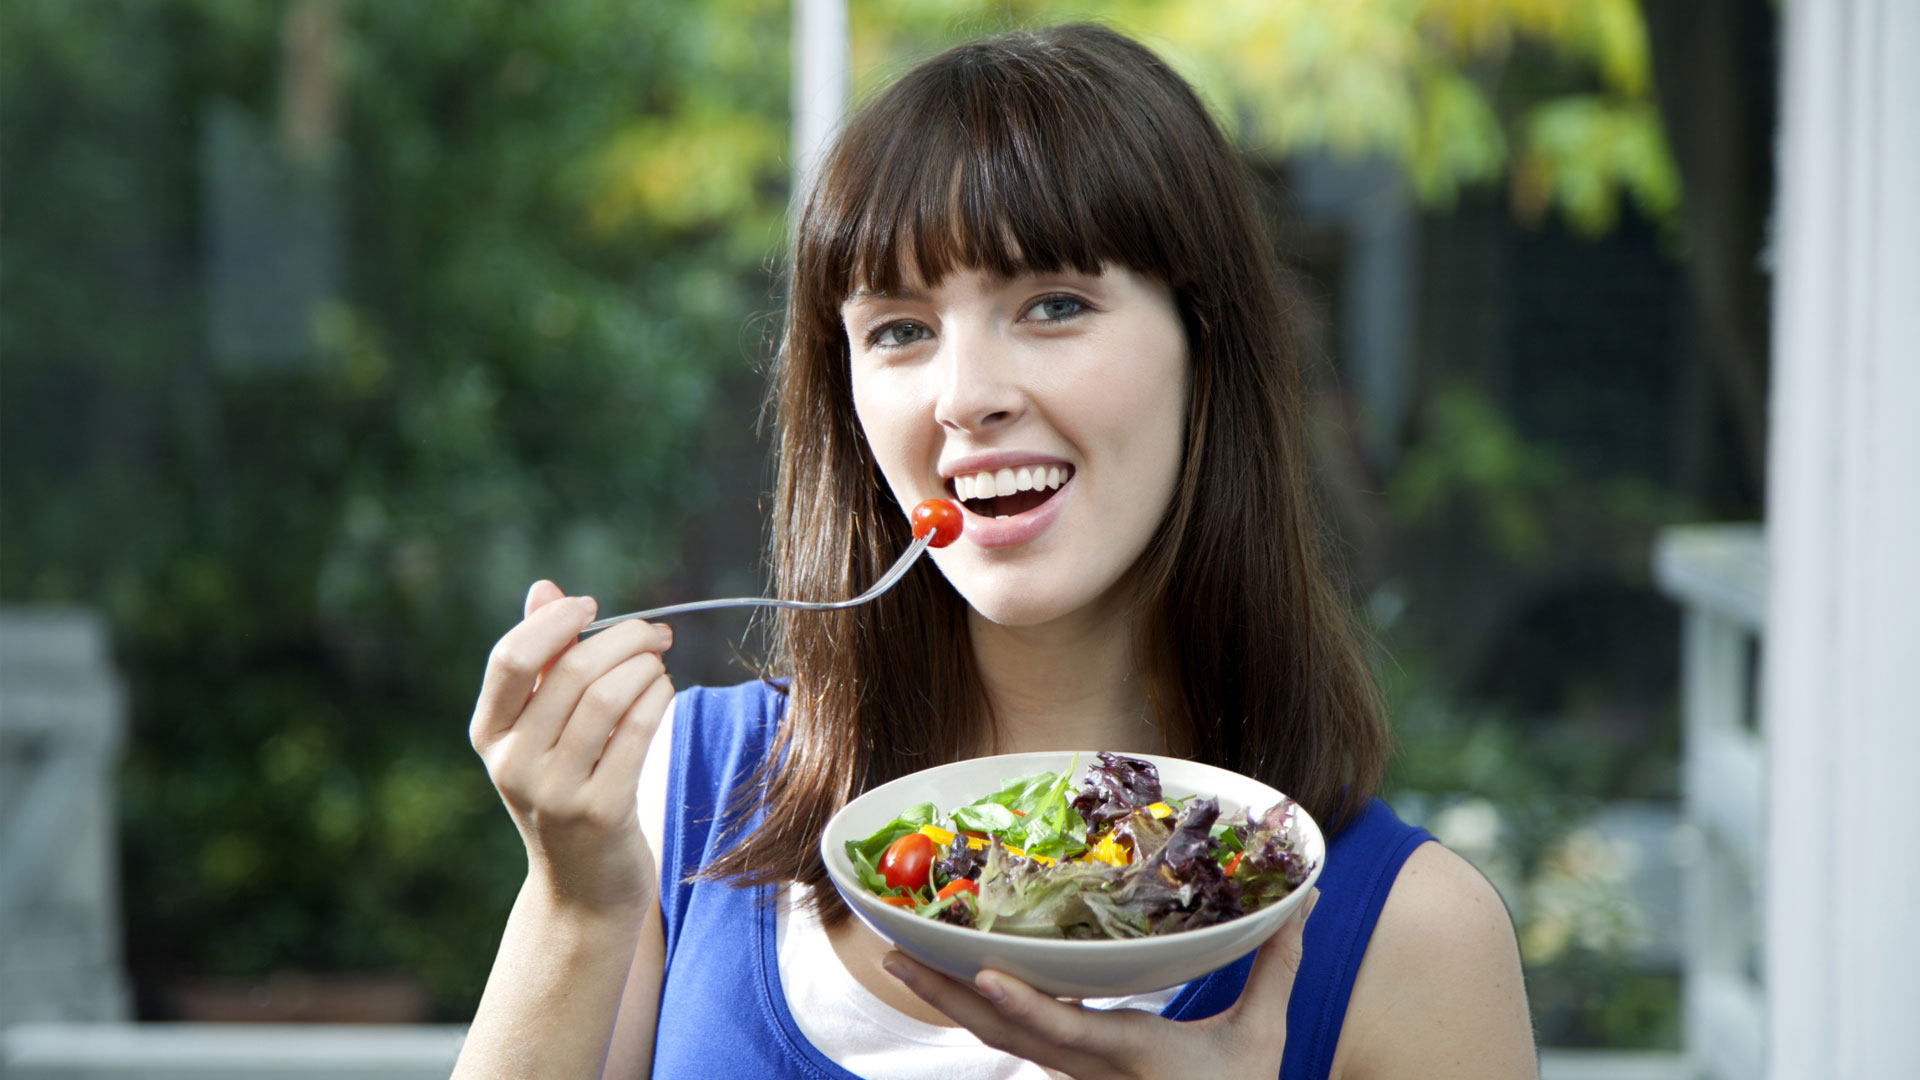 woman easting a salad